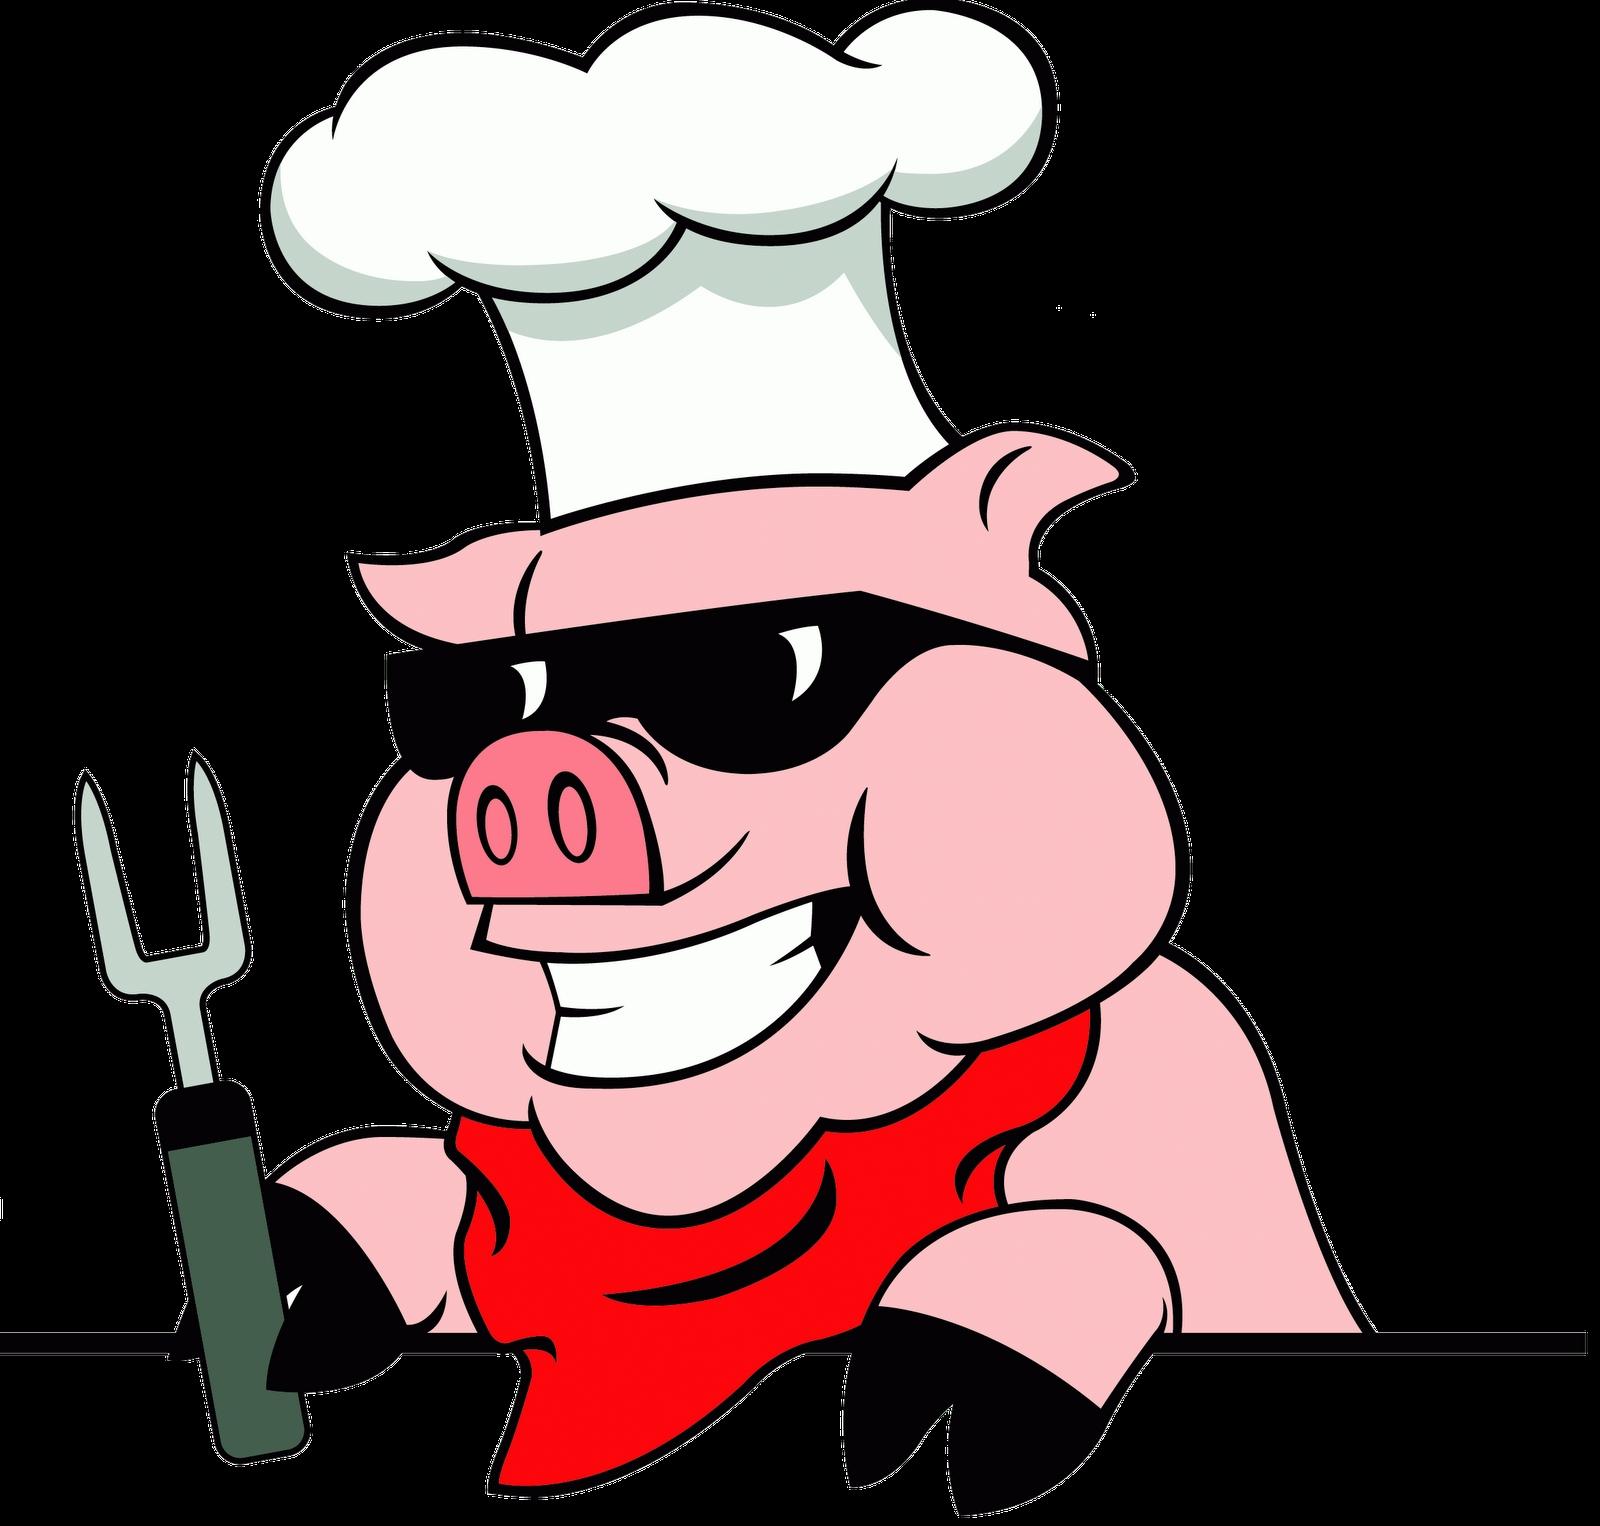 Barbecue clipart pig. Unique cartoon images clip